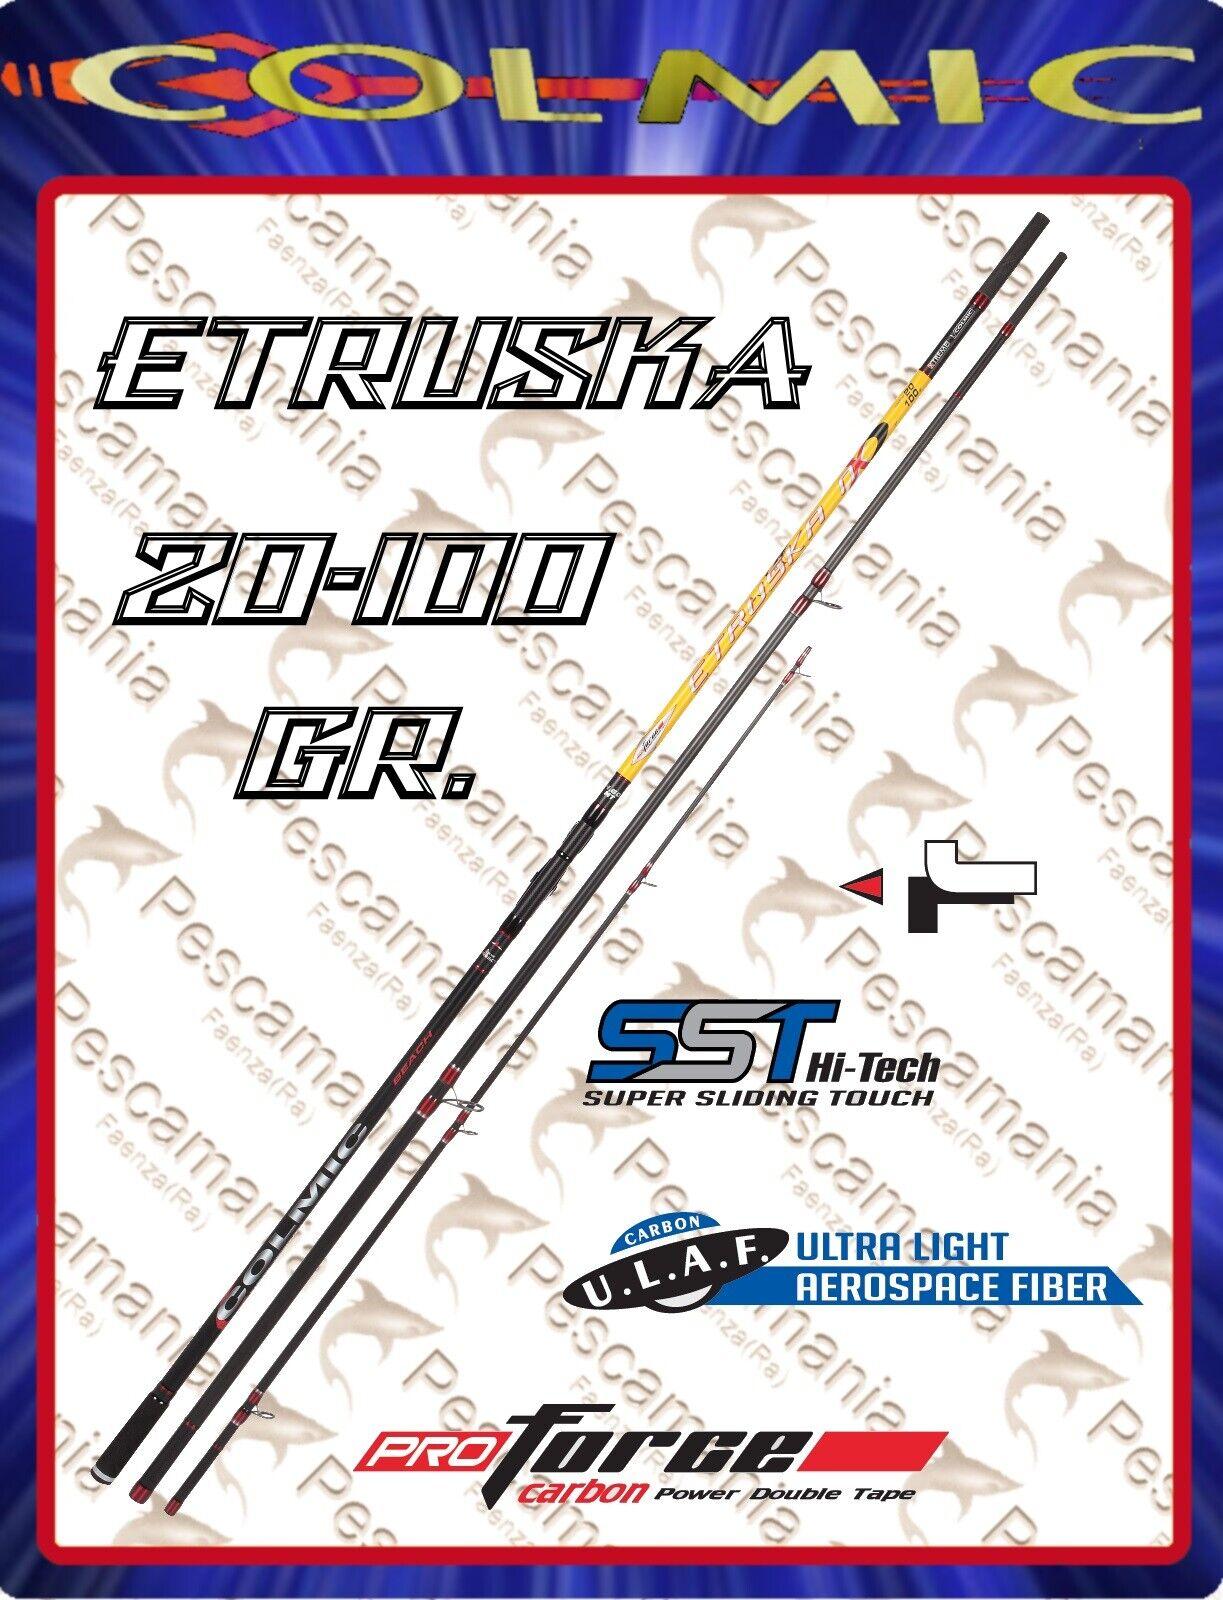 Canna Colmic ETRUSKA NX beach ledgering casting 20-100 gr 4,60-5,00mt.